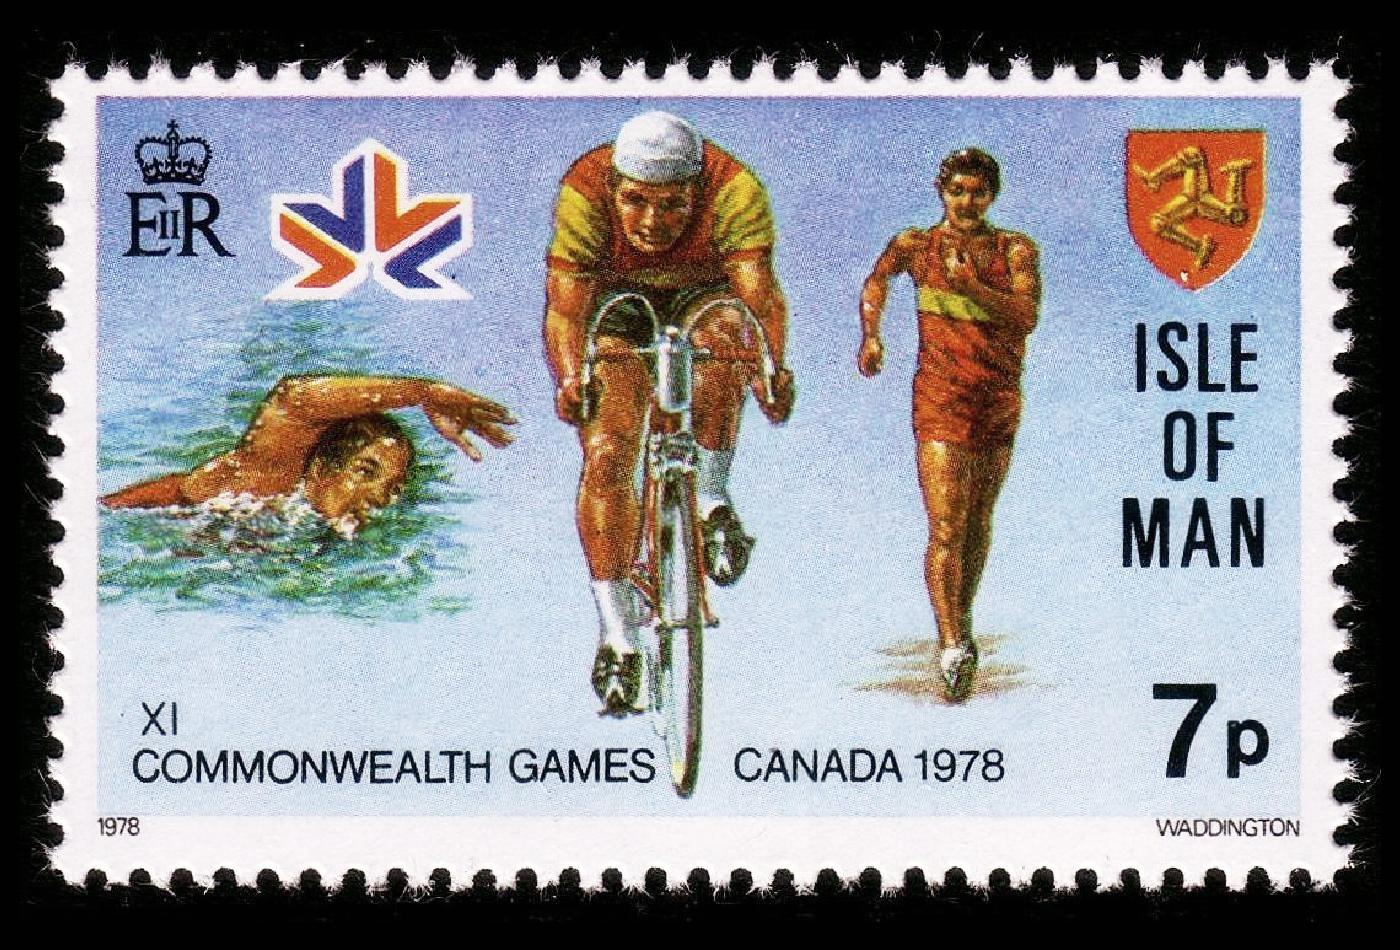 XI Commonwealth Games